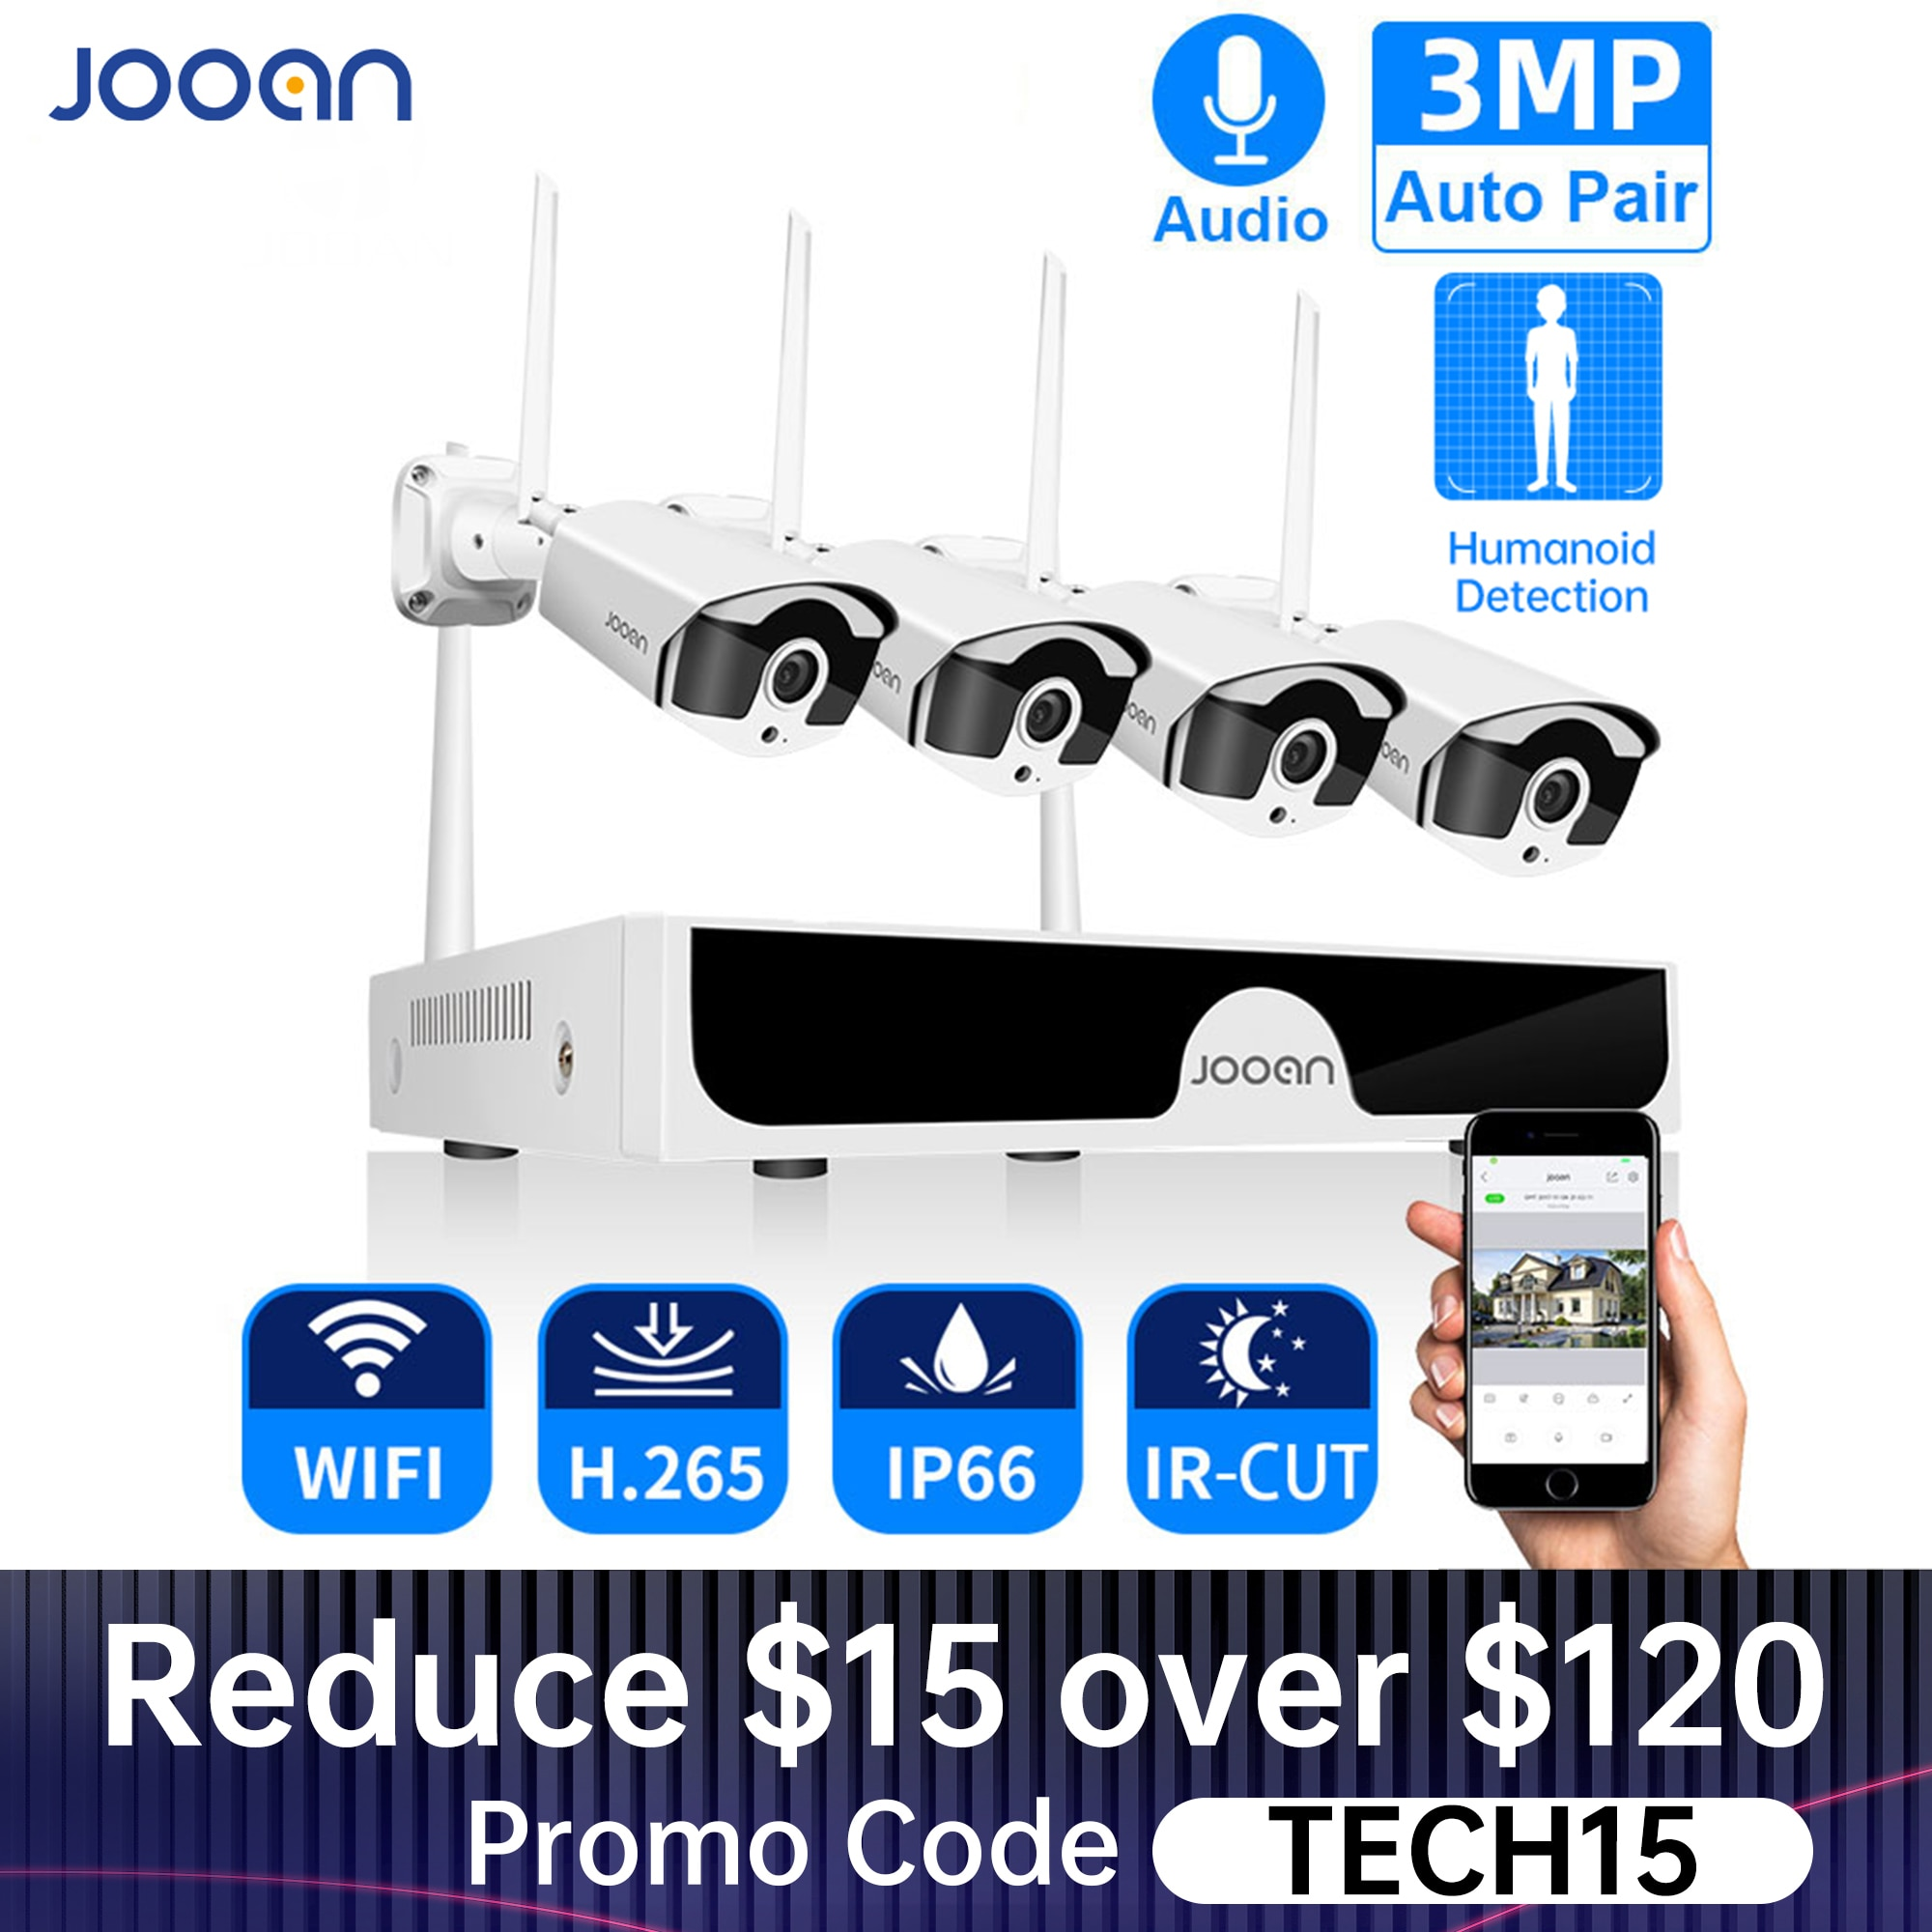 aliexpress - Jooan 8CH NVR HD 3MP CCTV Camera System Audio Record Outdoor P2P Wifi IP Security Camera Set Video Surveillance Kit